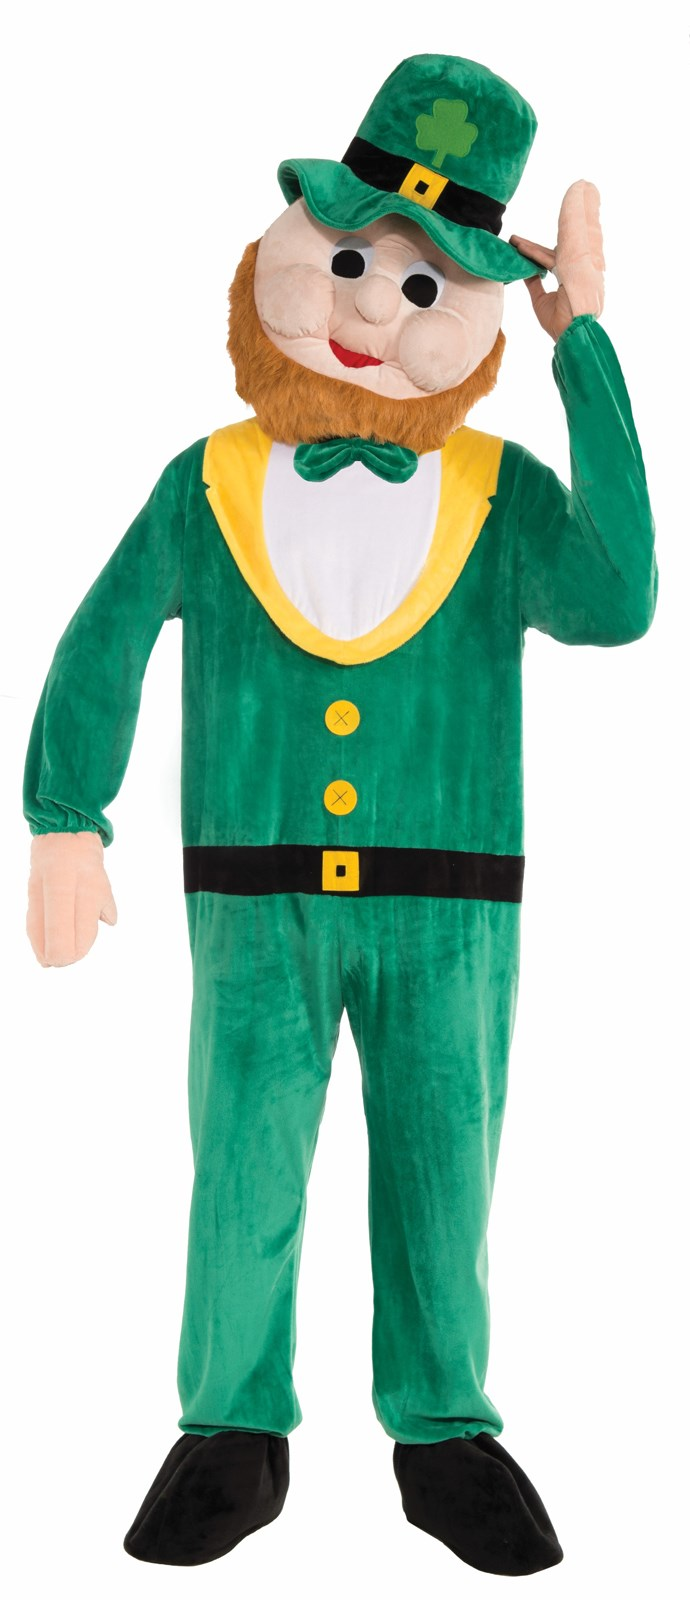 Leprechaun Mascot Adult Costume | BuyCostumes.com